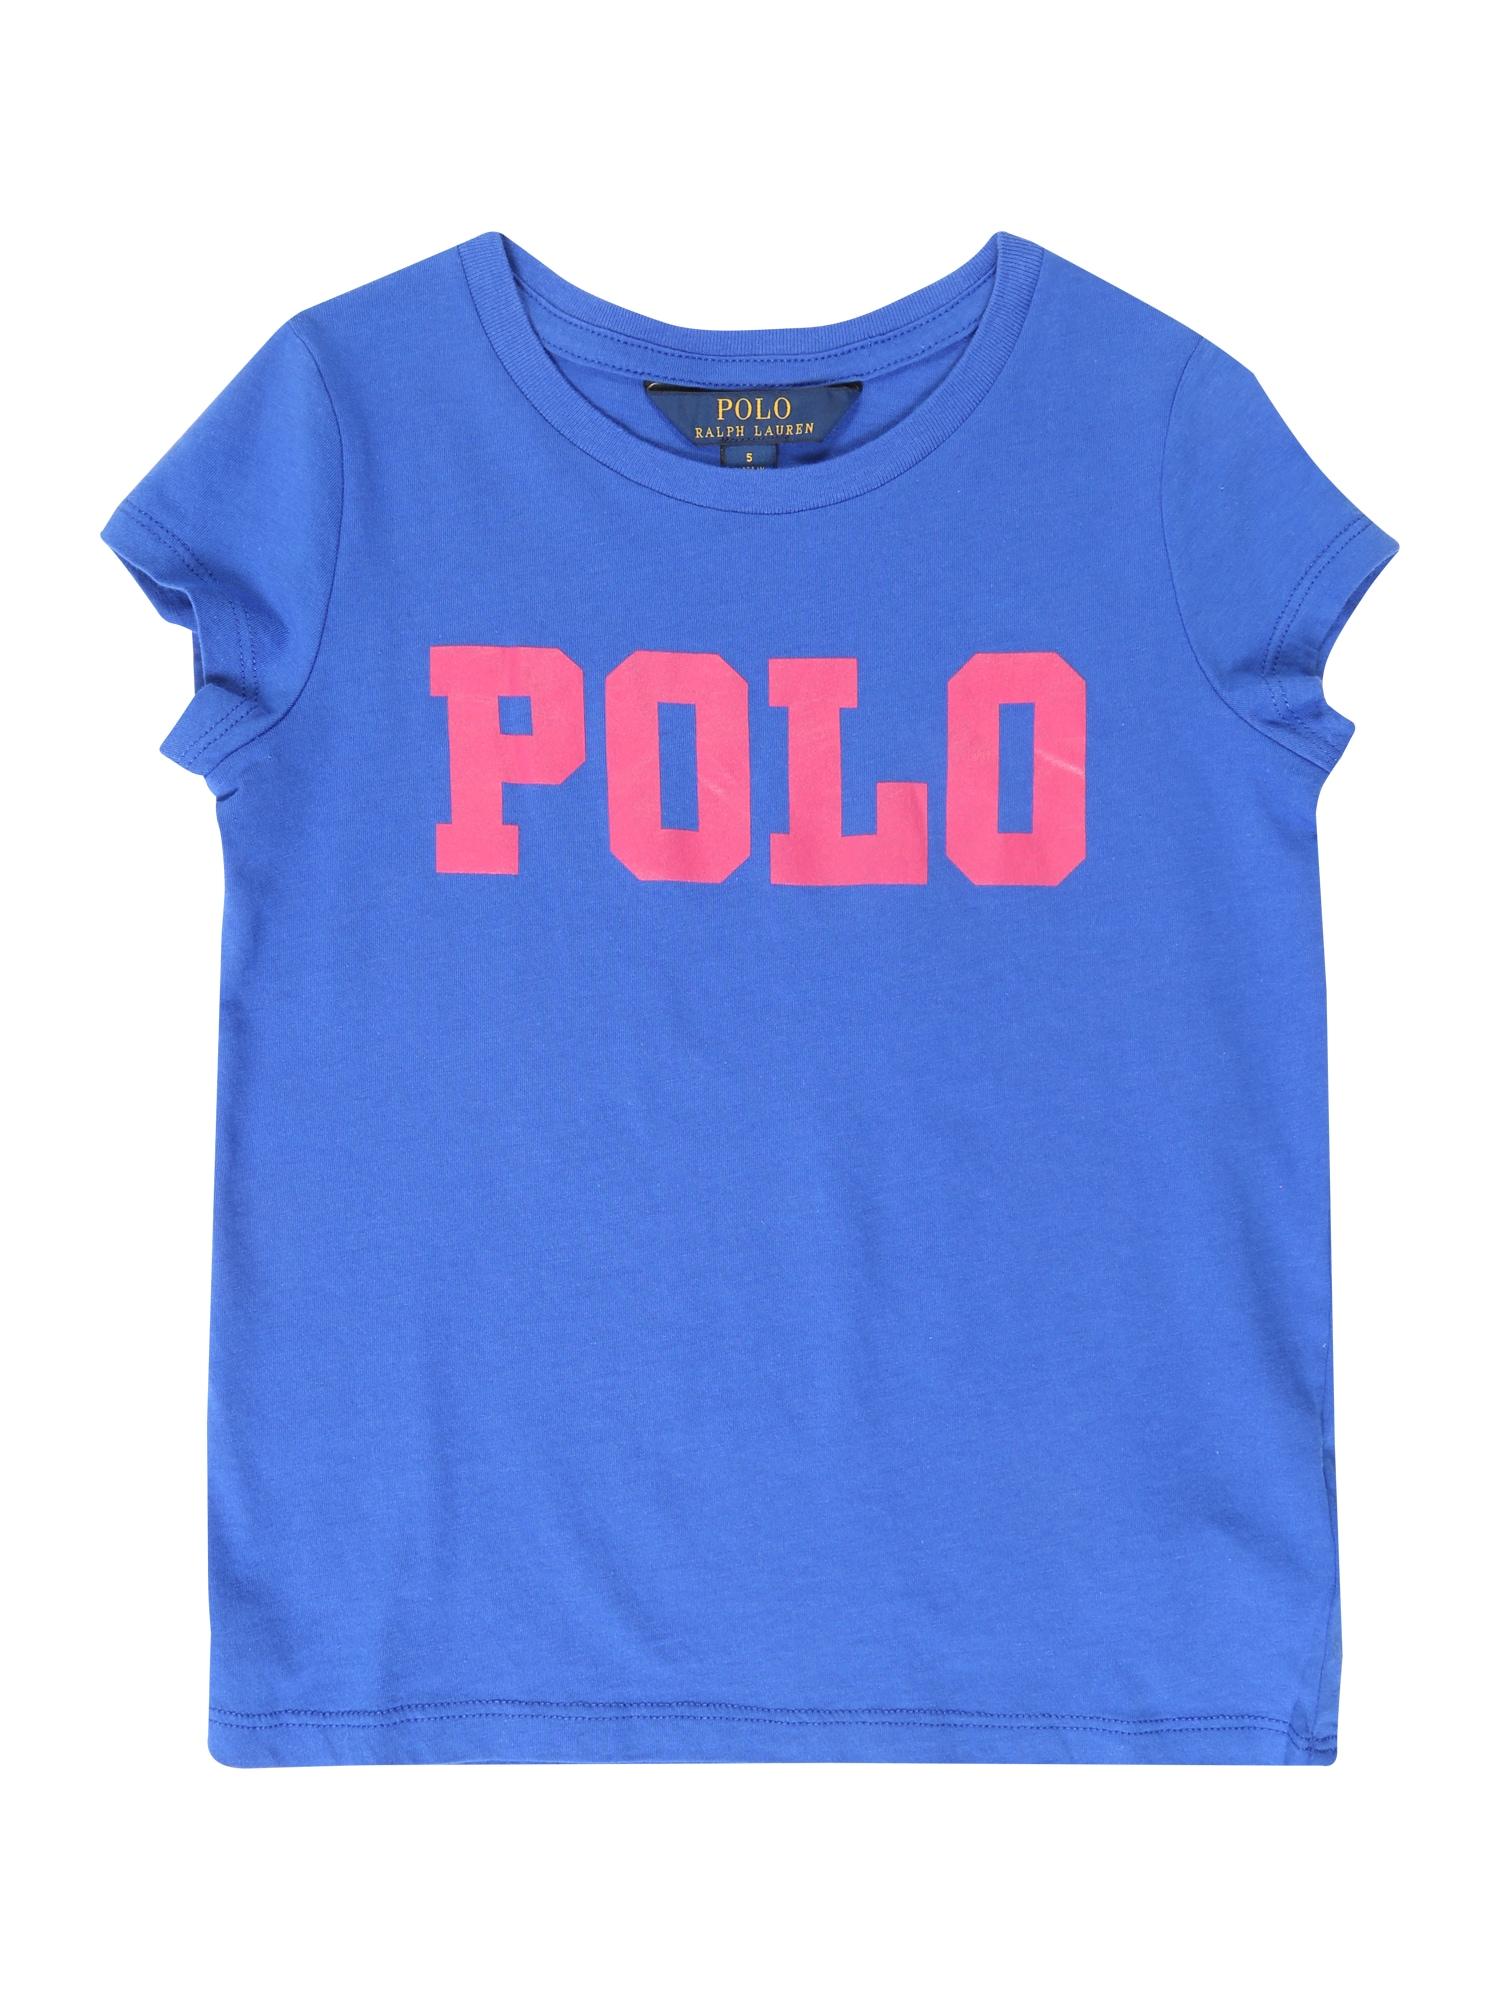 Tričko COTTON ENZYME modrá tmavě růžová POLO RALPH LAUREN